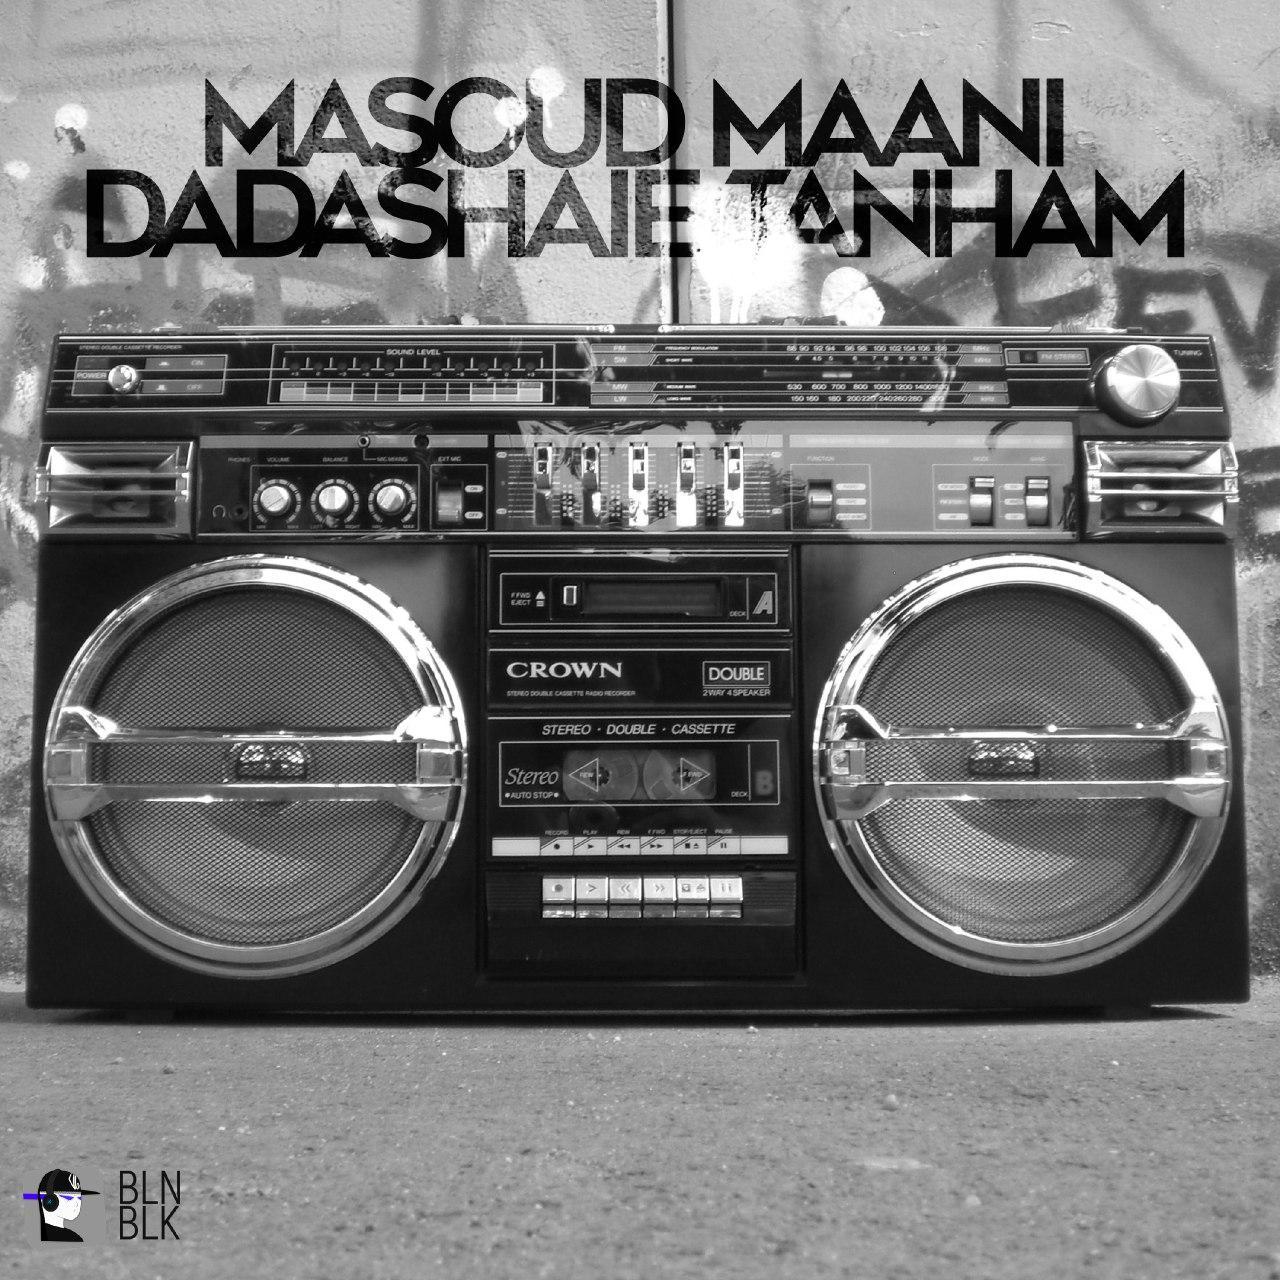 Masoud Maani – Dadashaie Tanham